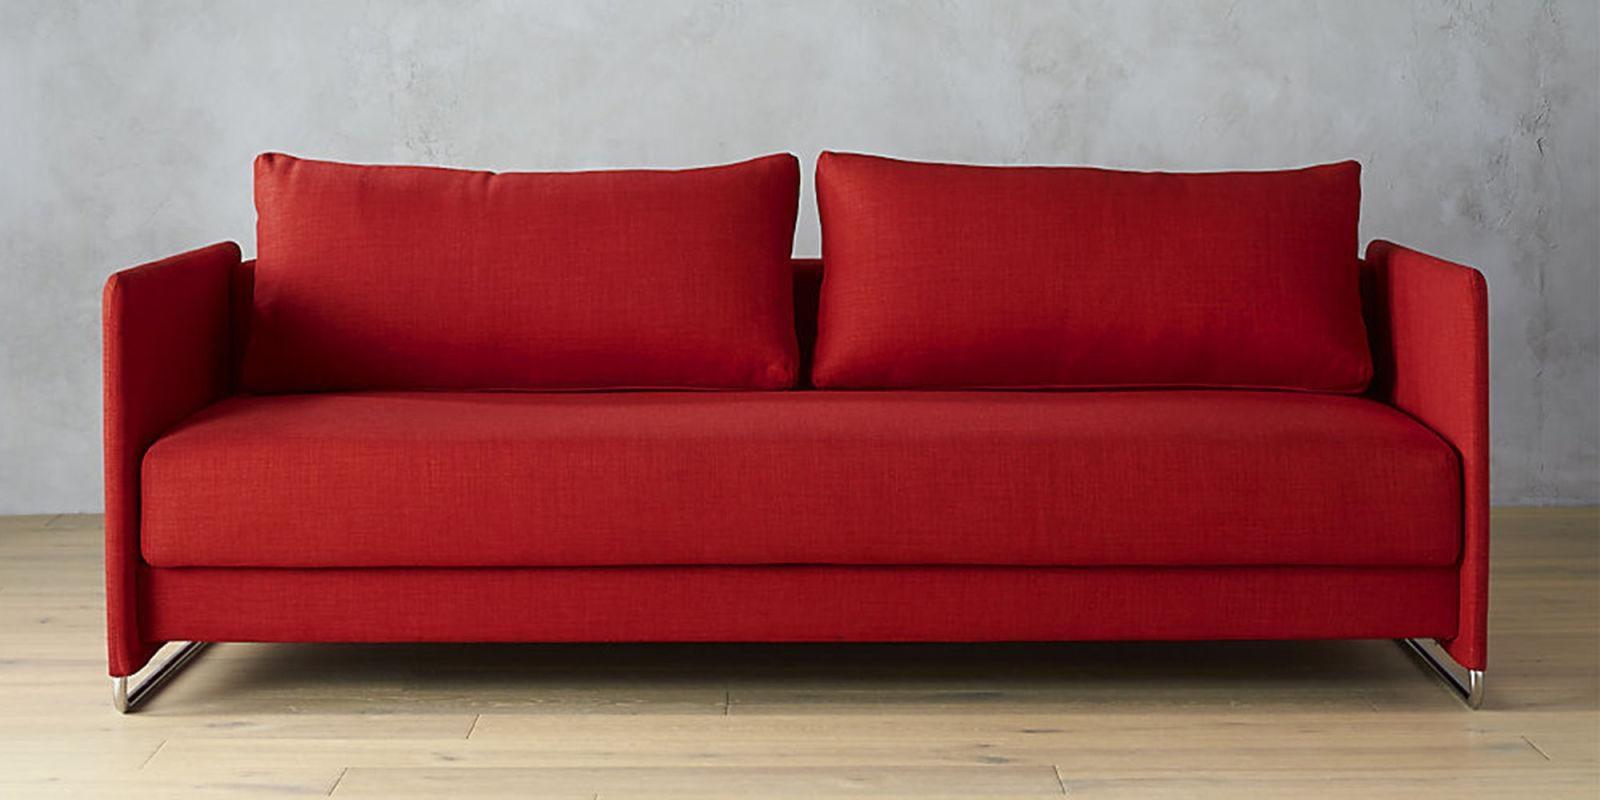 Featured Image of Everyday Sleeper Sofas